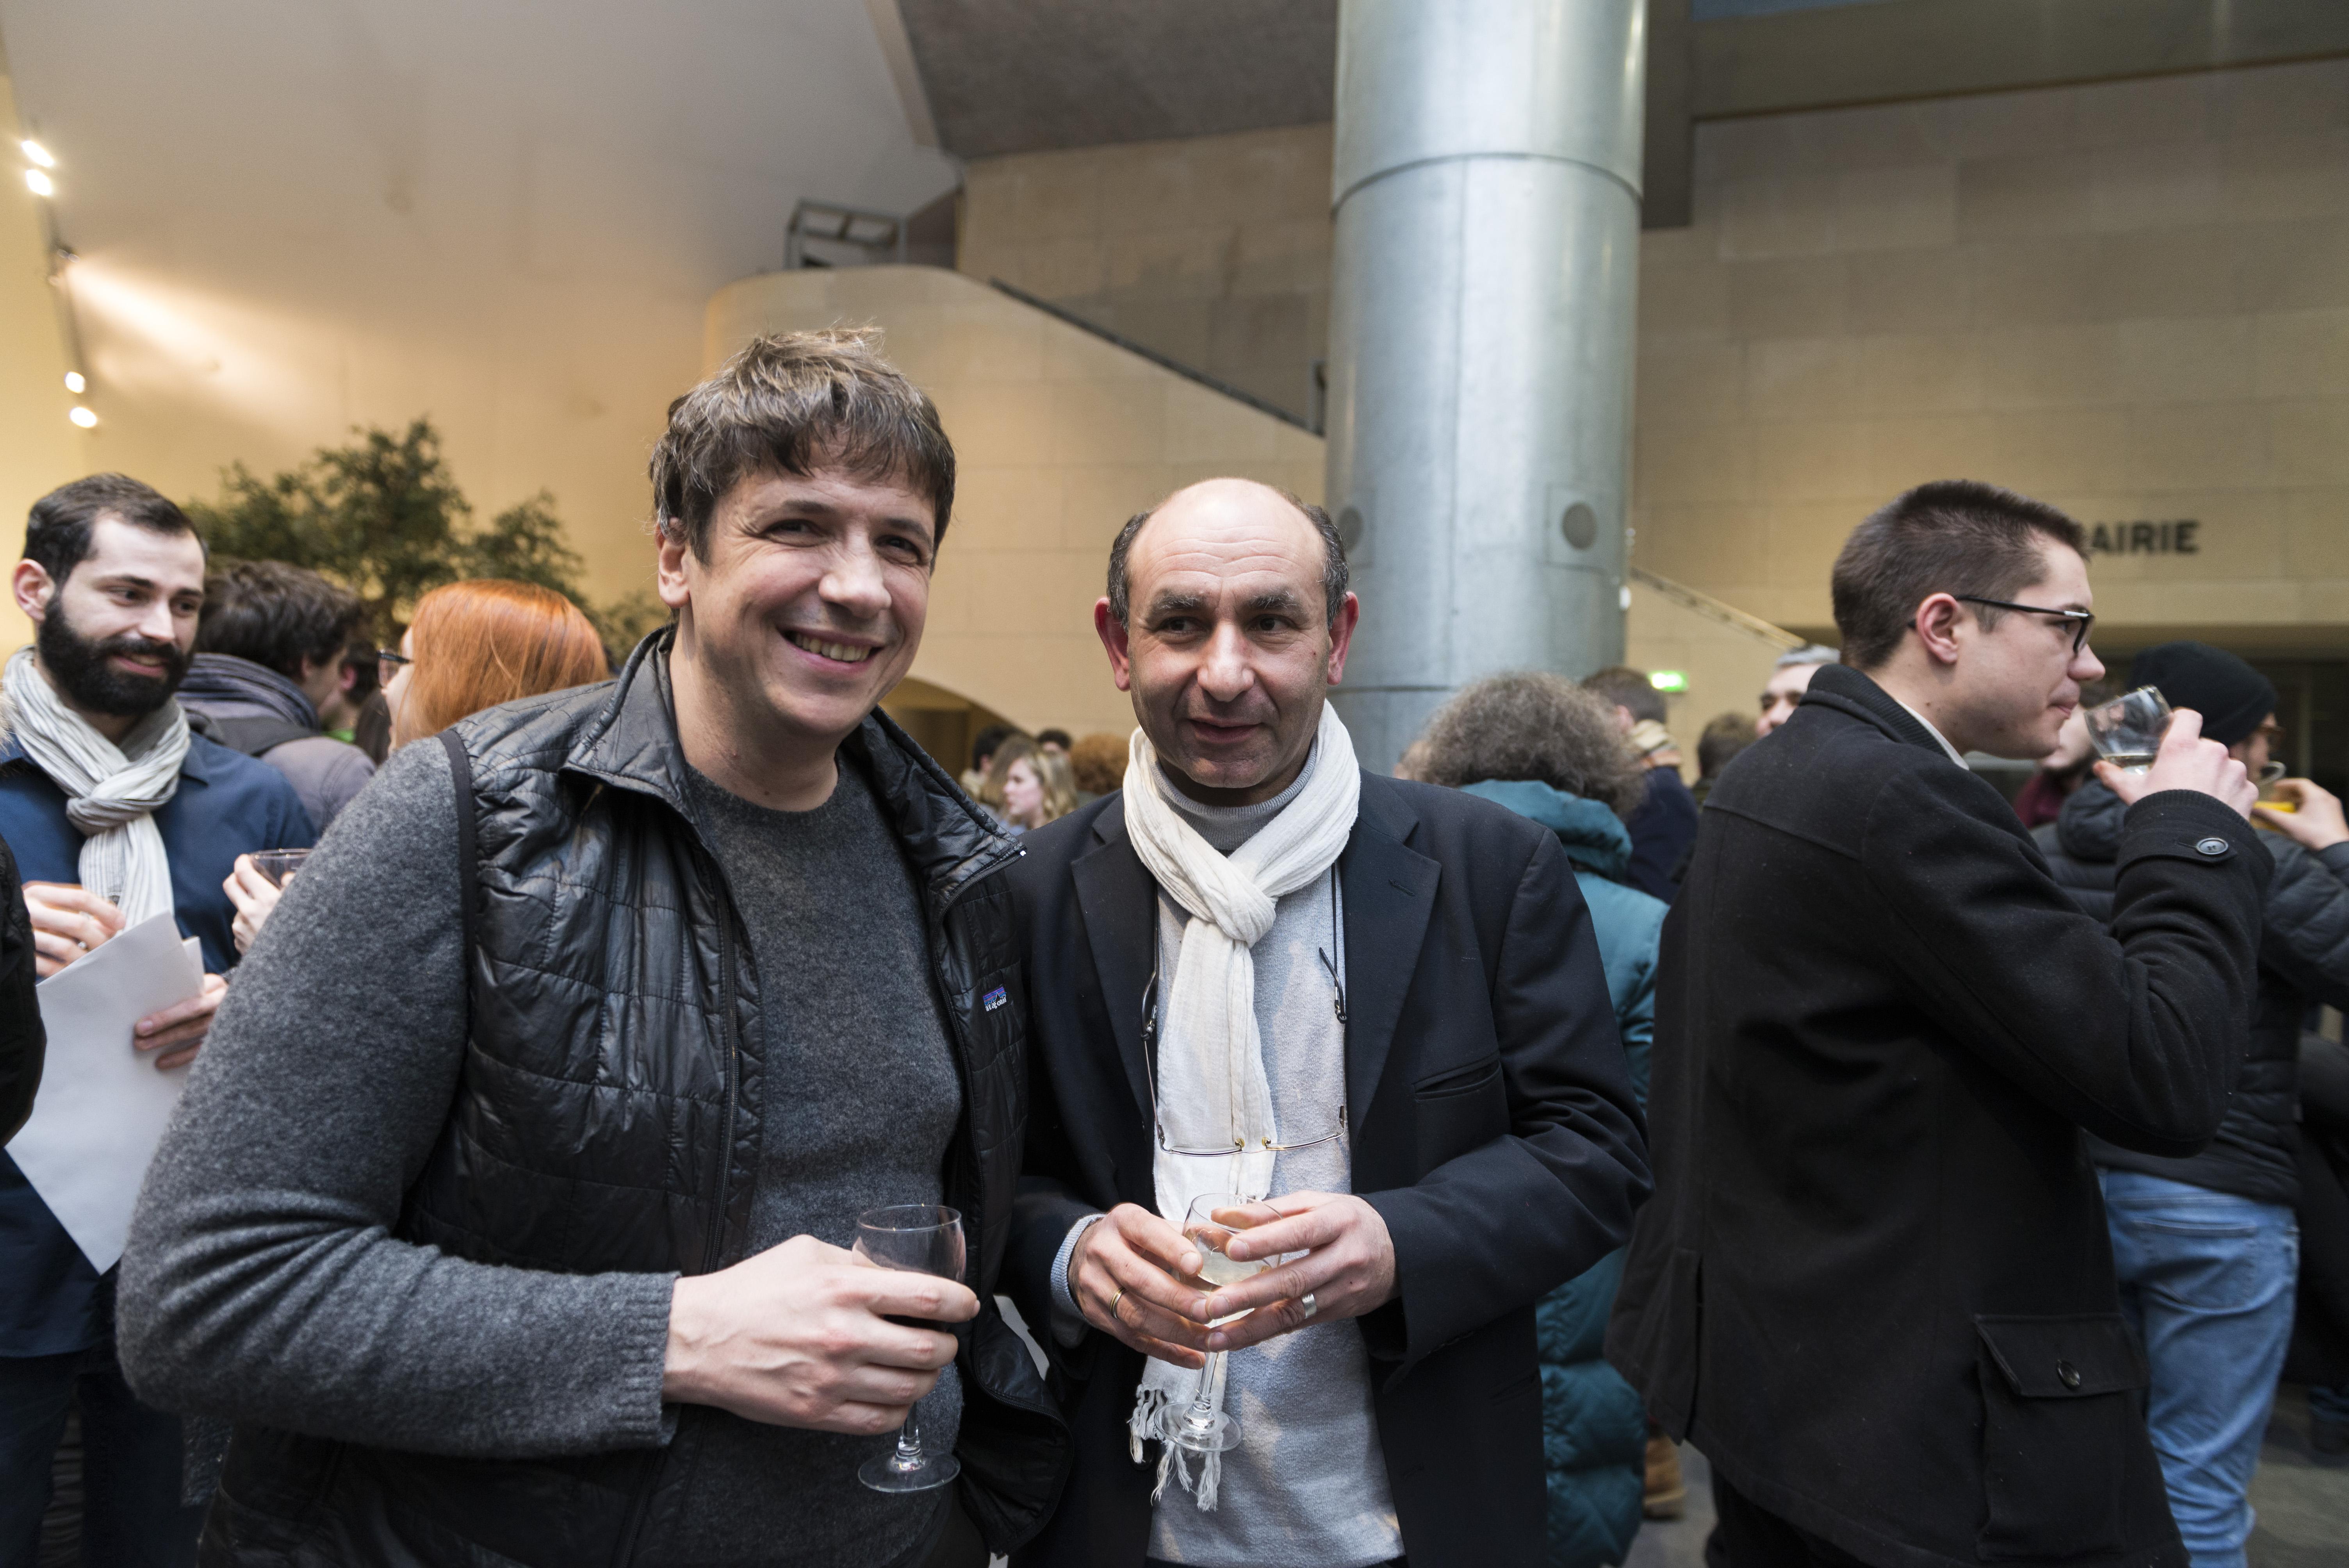 Soirée des diplômés 2017 - Gilles Gaillard et Pascal Martin